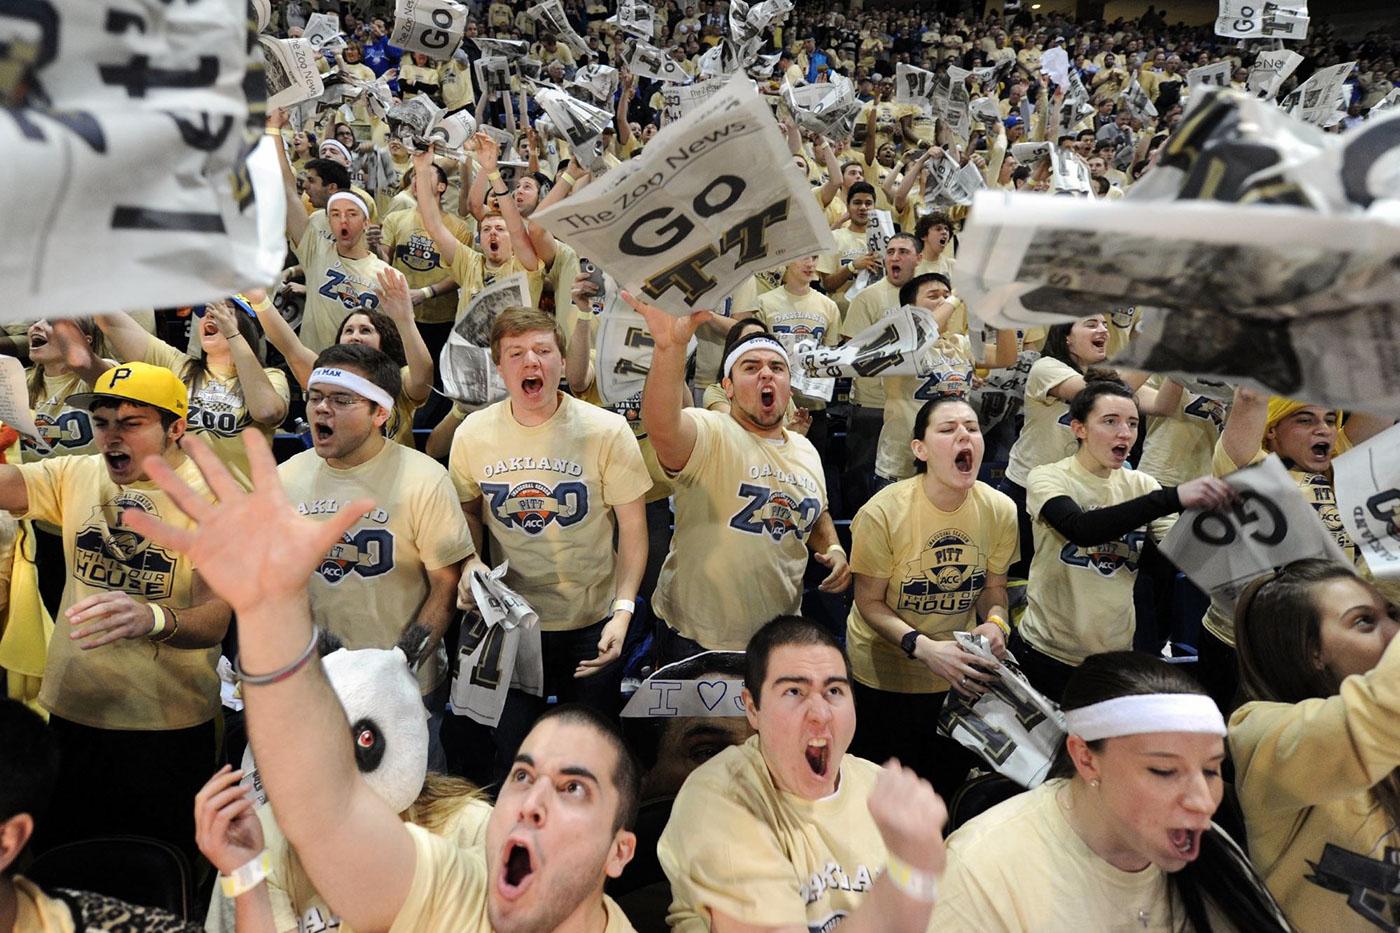 oakland zoo Pittsburgh University basketball student group student logo tshirt